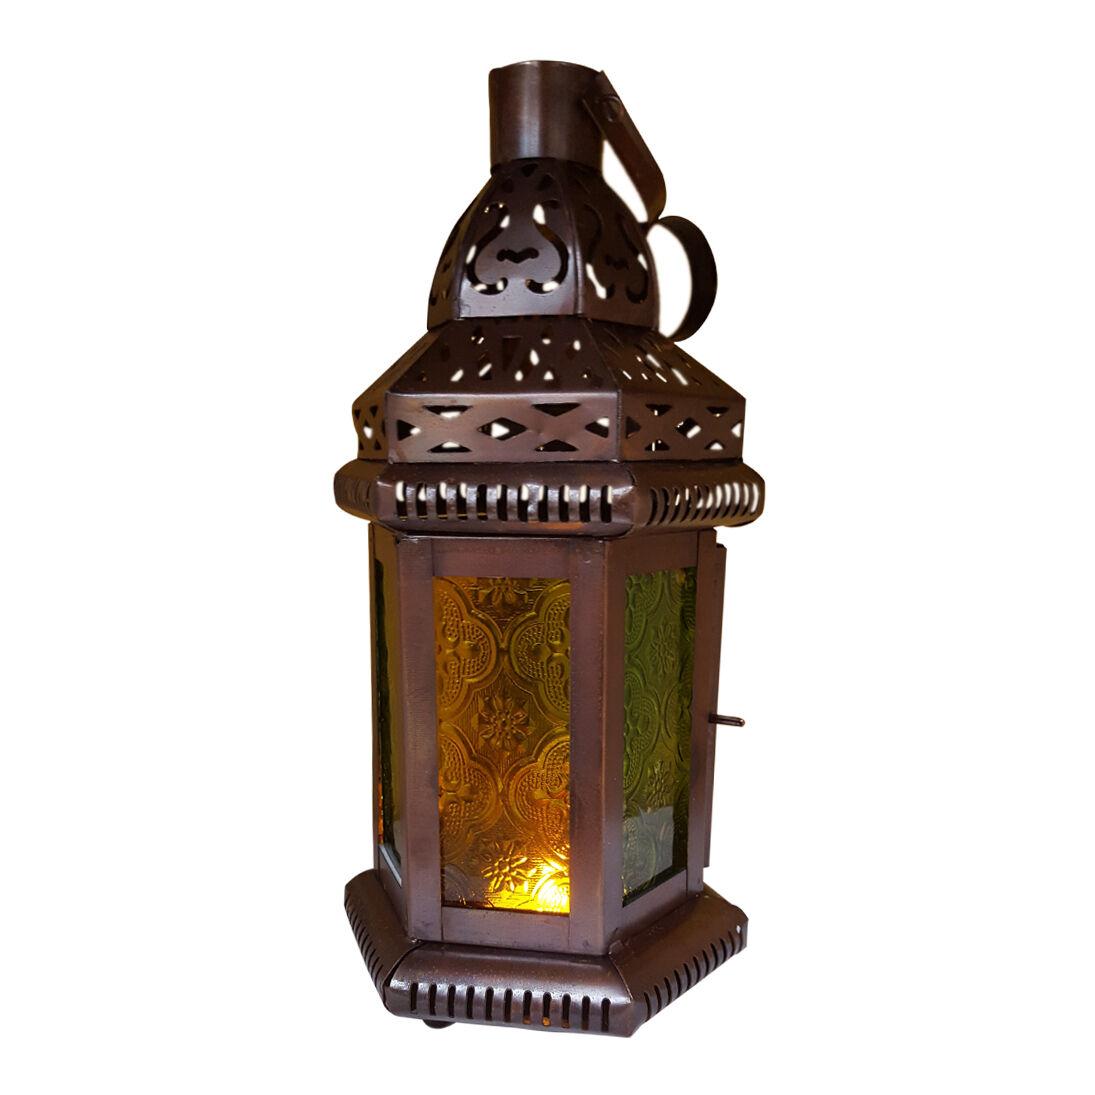 Set of  5 - Grün & Gelb Glass MGoldccan Lantern, Candle Holder